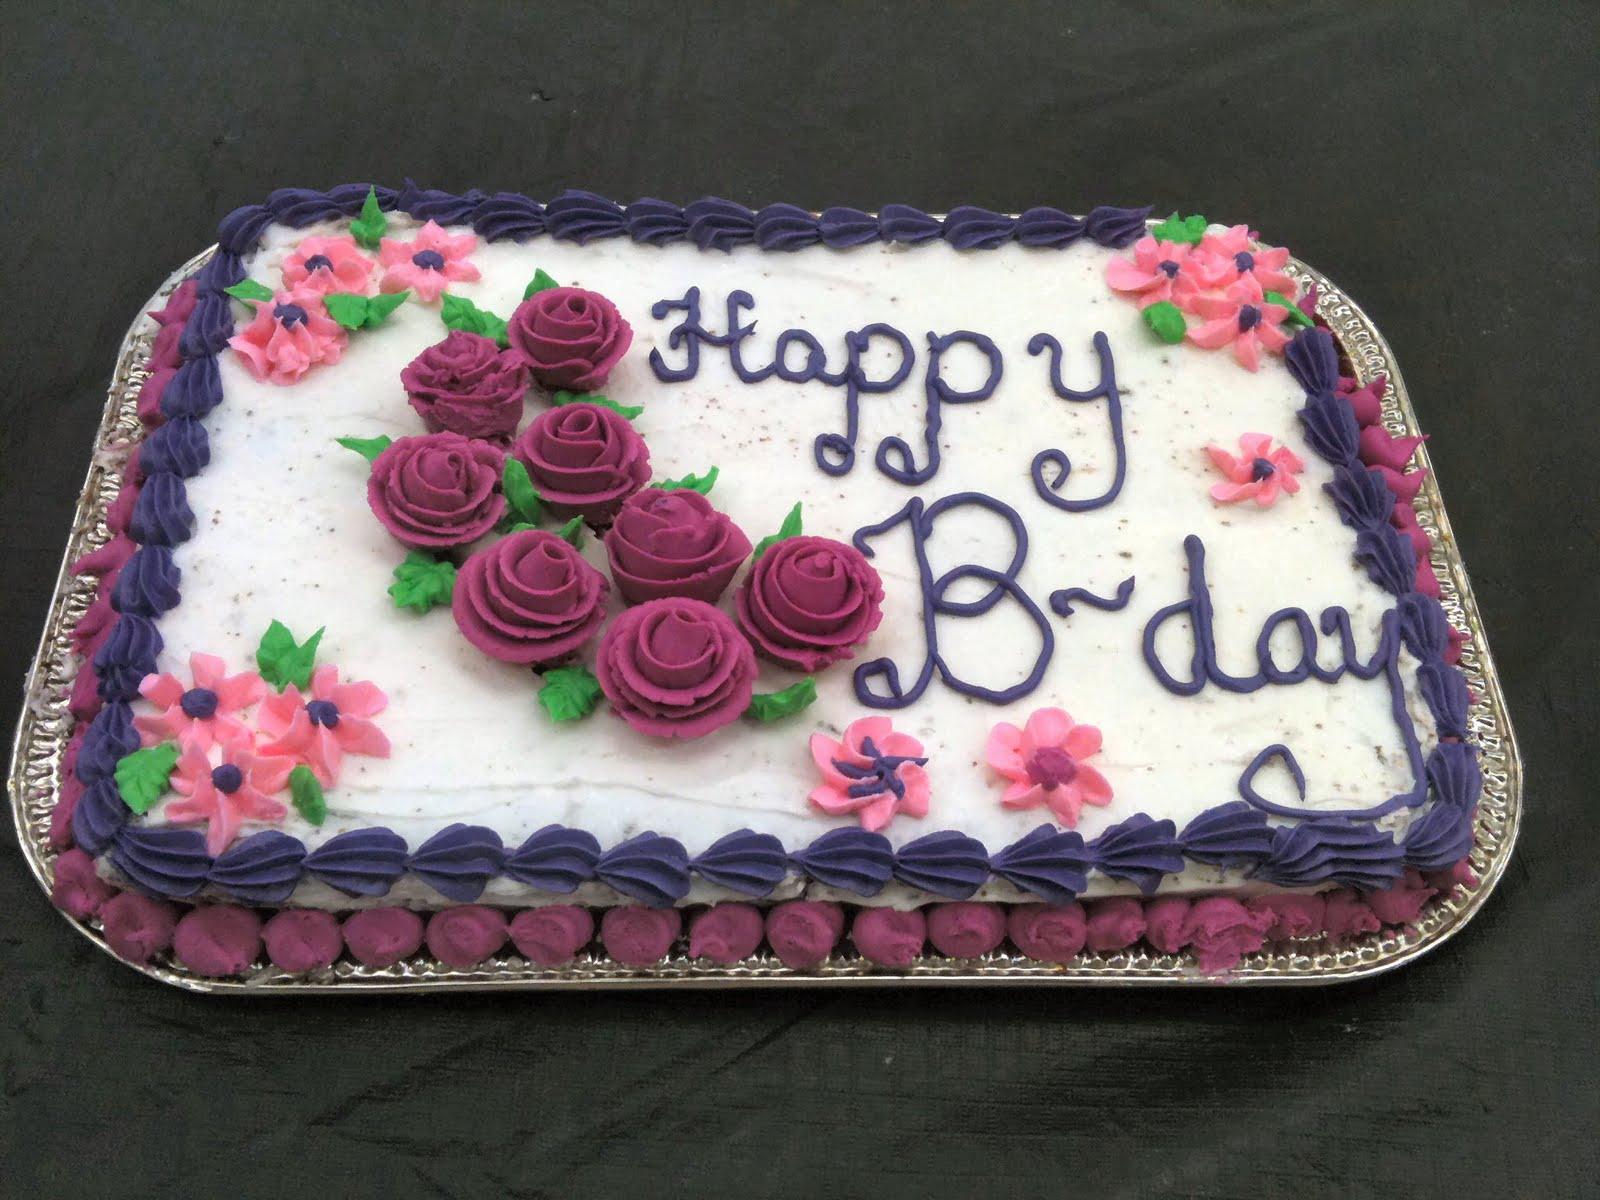 Cake Decorating by Sonia: May Decorating Basics - Final ...